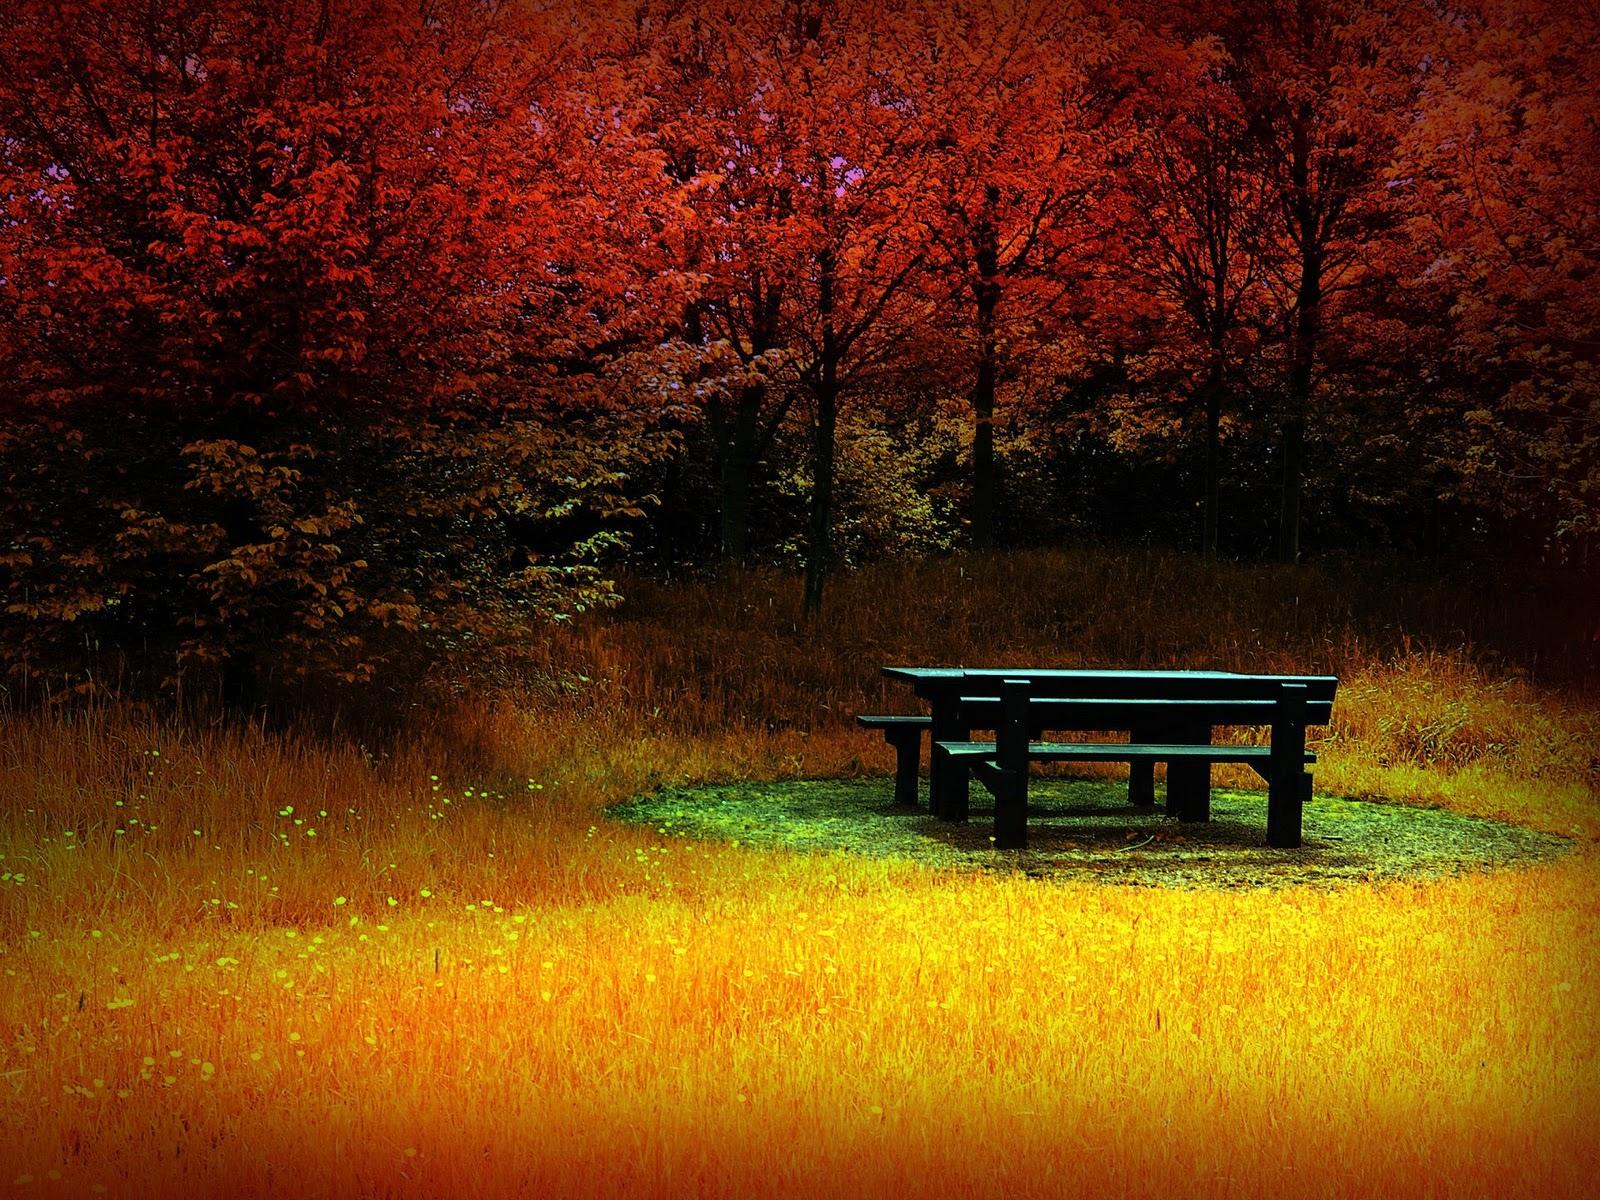 The best top autumn desktop wallpapers 31 En Güzel Sonbahar HD Duvar Kağıtları